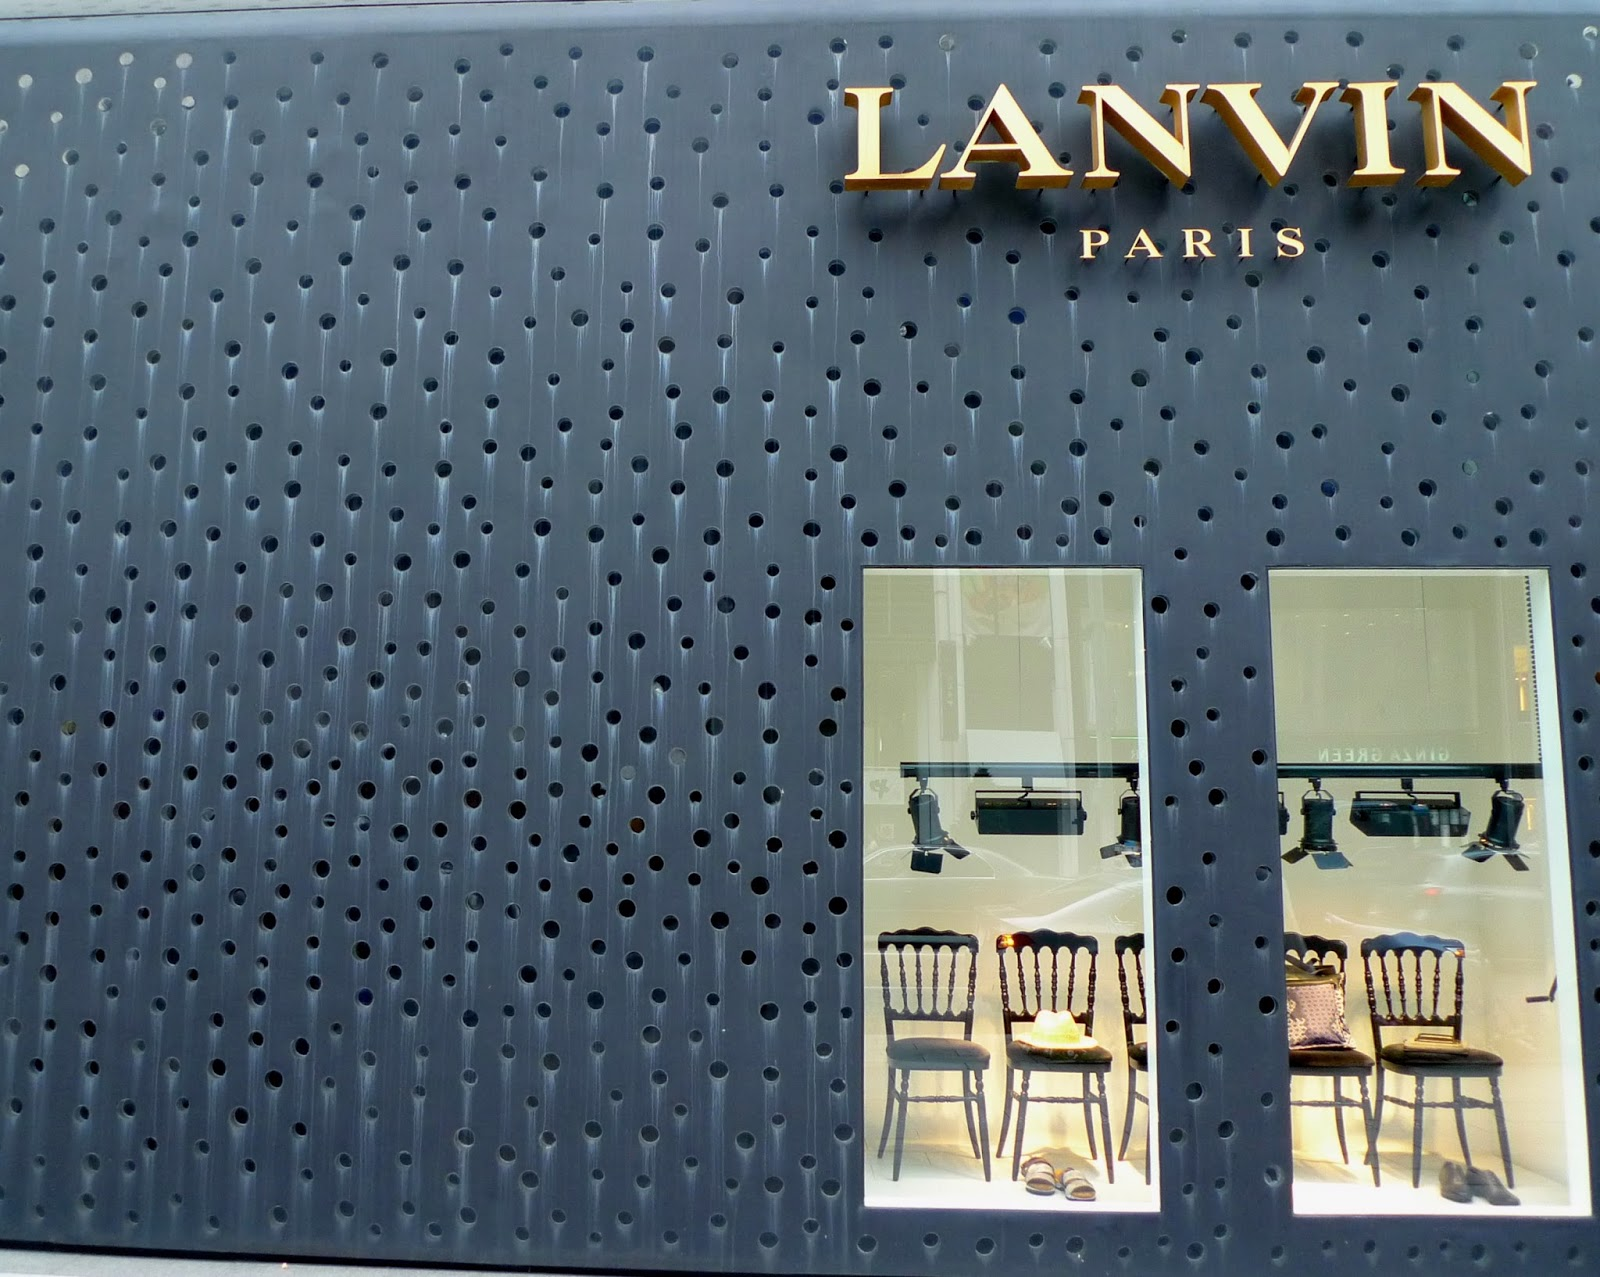 Lanvin store Ginza, Tokyo